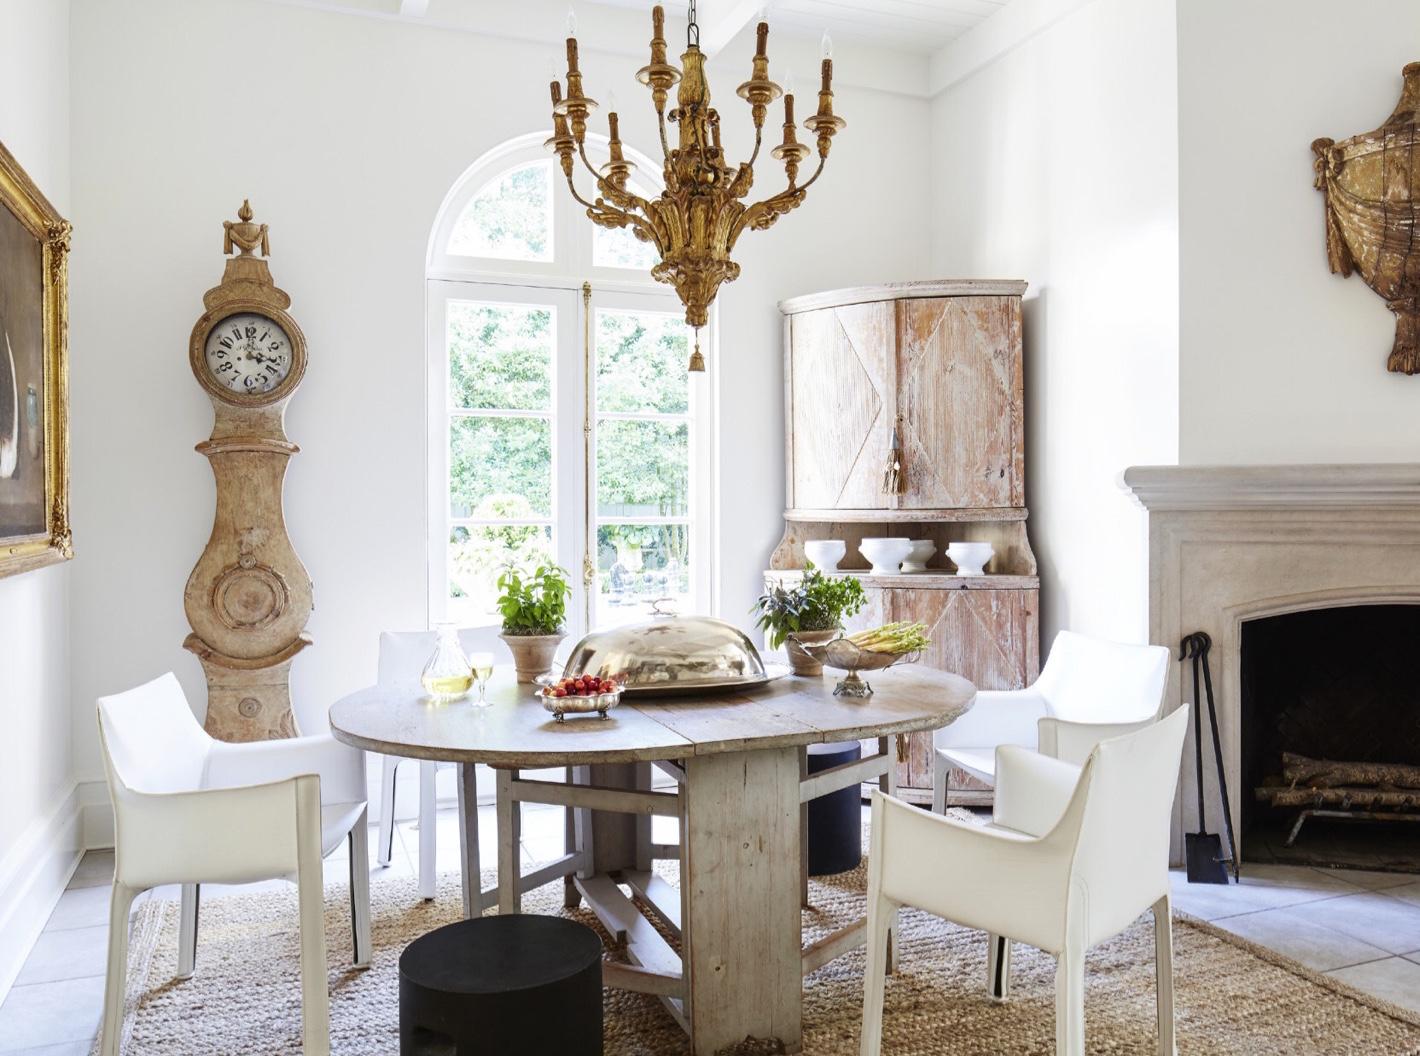 Splendid sass tara shaw design in new orleans for Tara louise interior decoration design